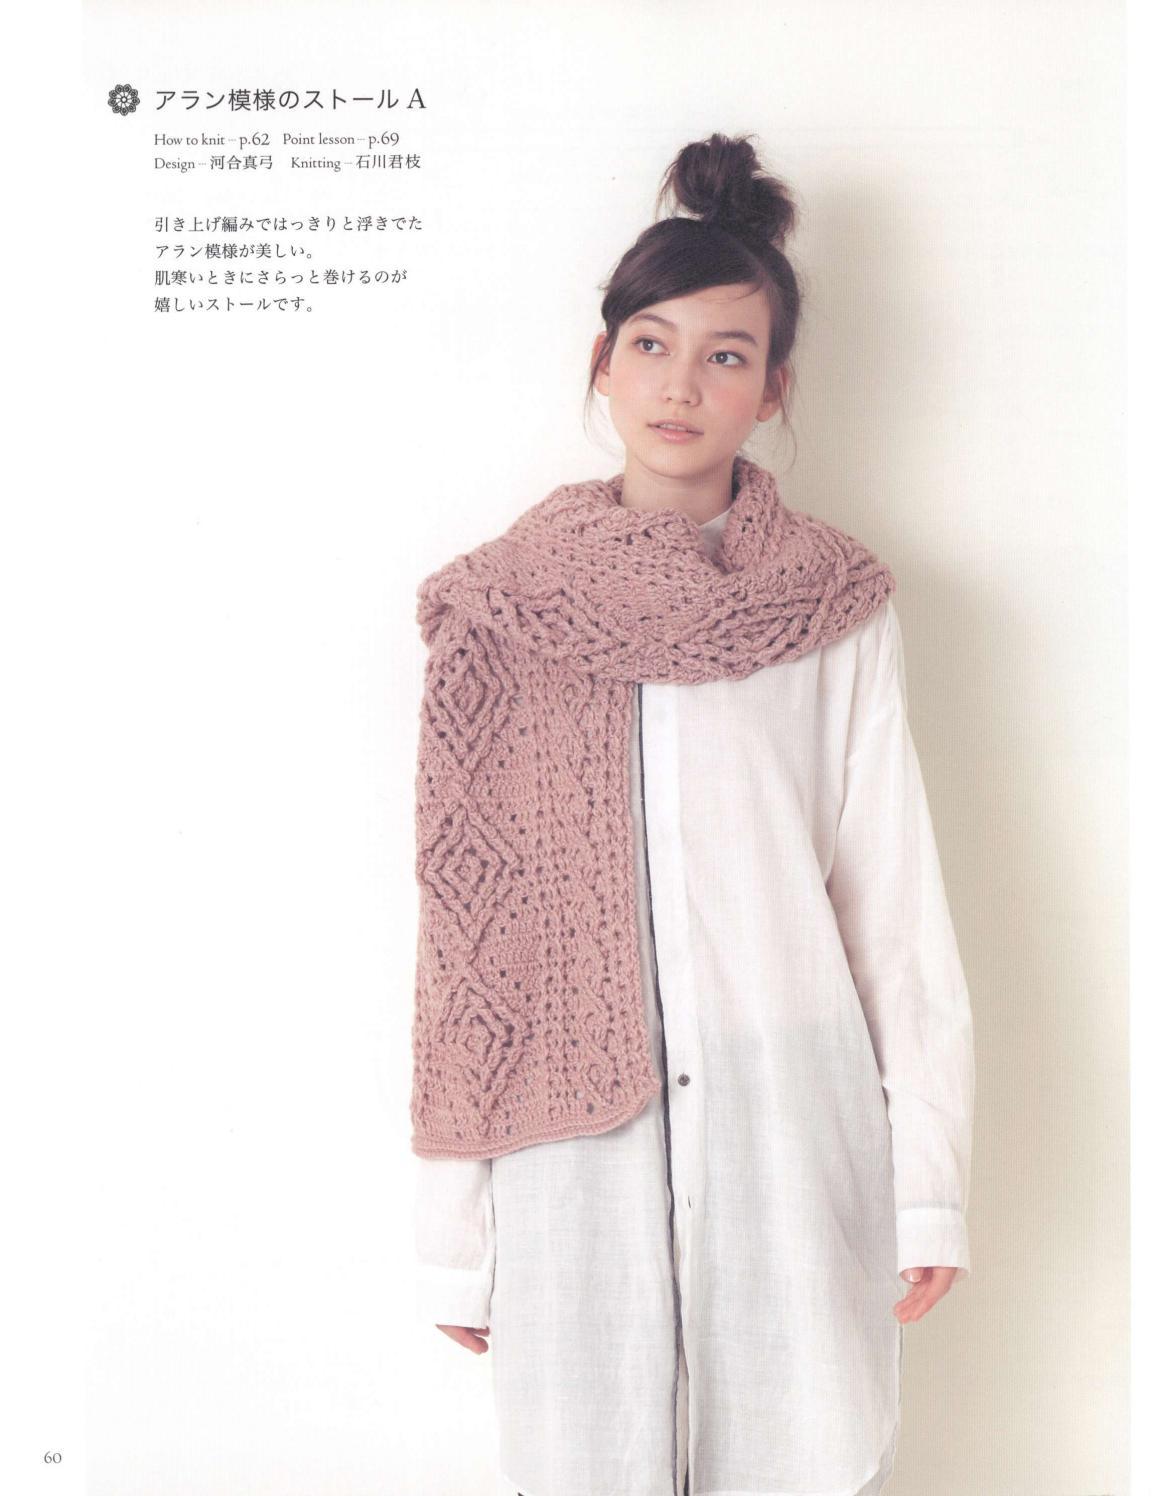 Asahi original crochet best selection 2012 page 60